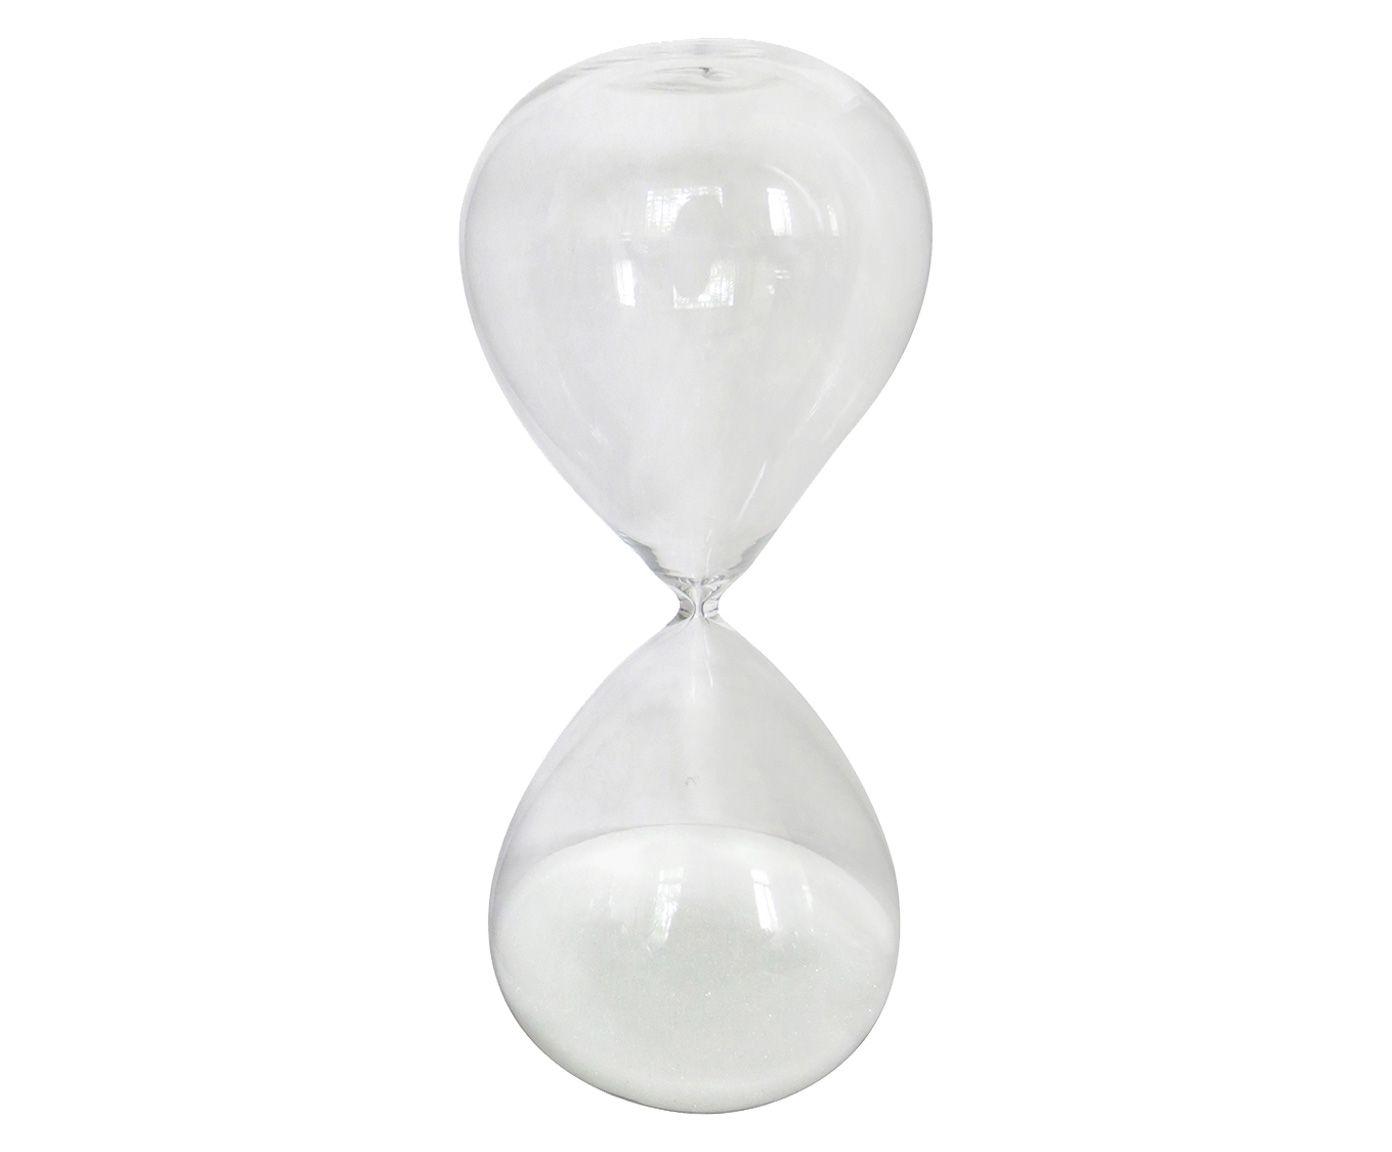 Ampulheta Branca 15 Minutos - 8cm   Westwing.com.br